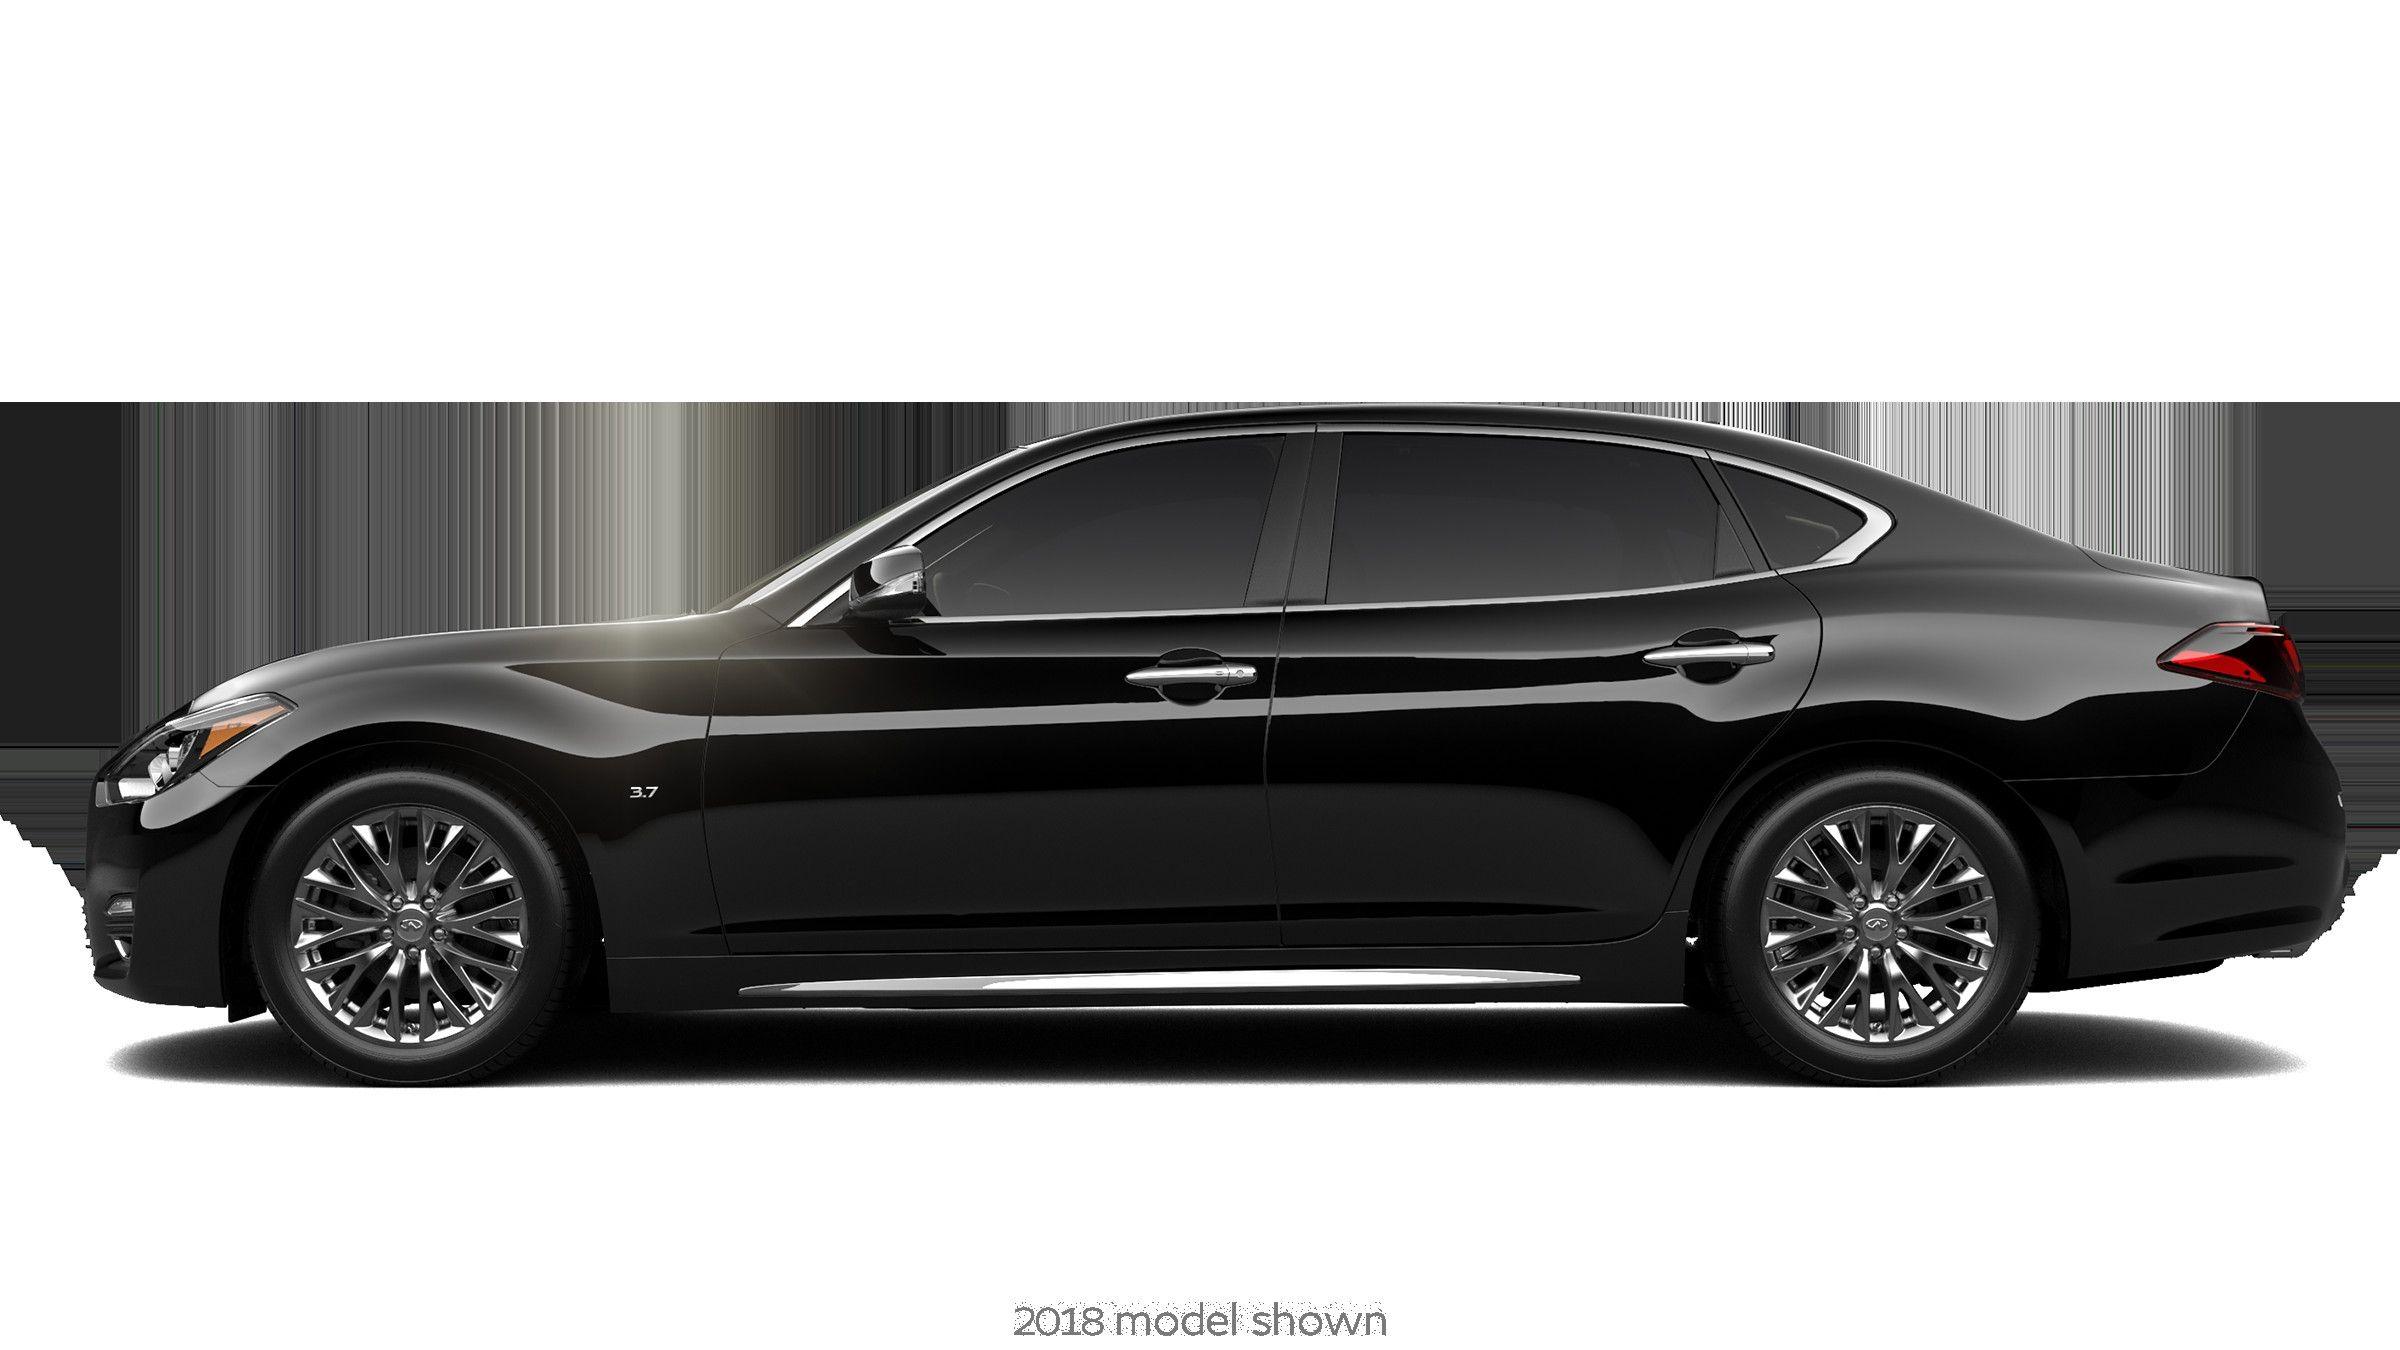 2019 G37 New Review Car, Infiniti g37, Infiniti